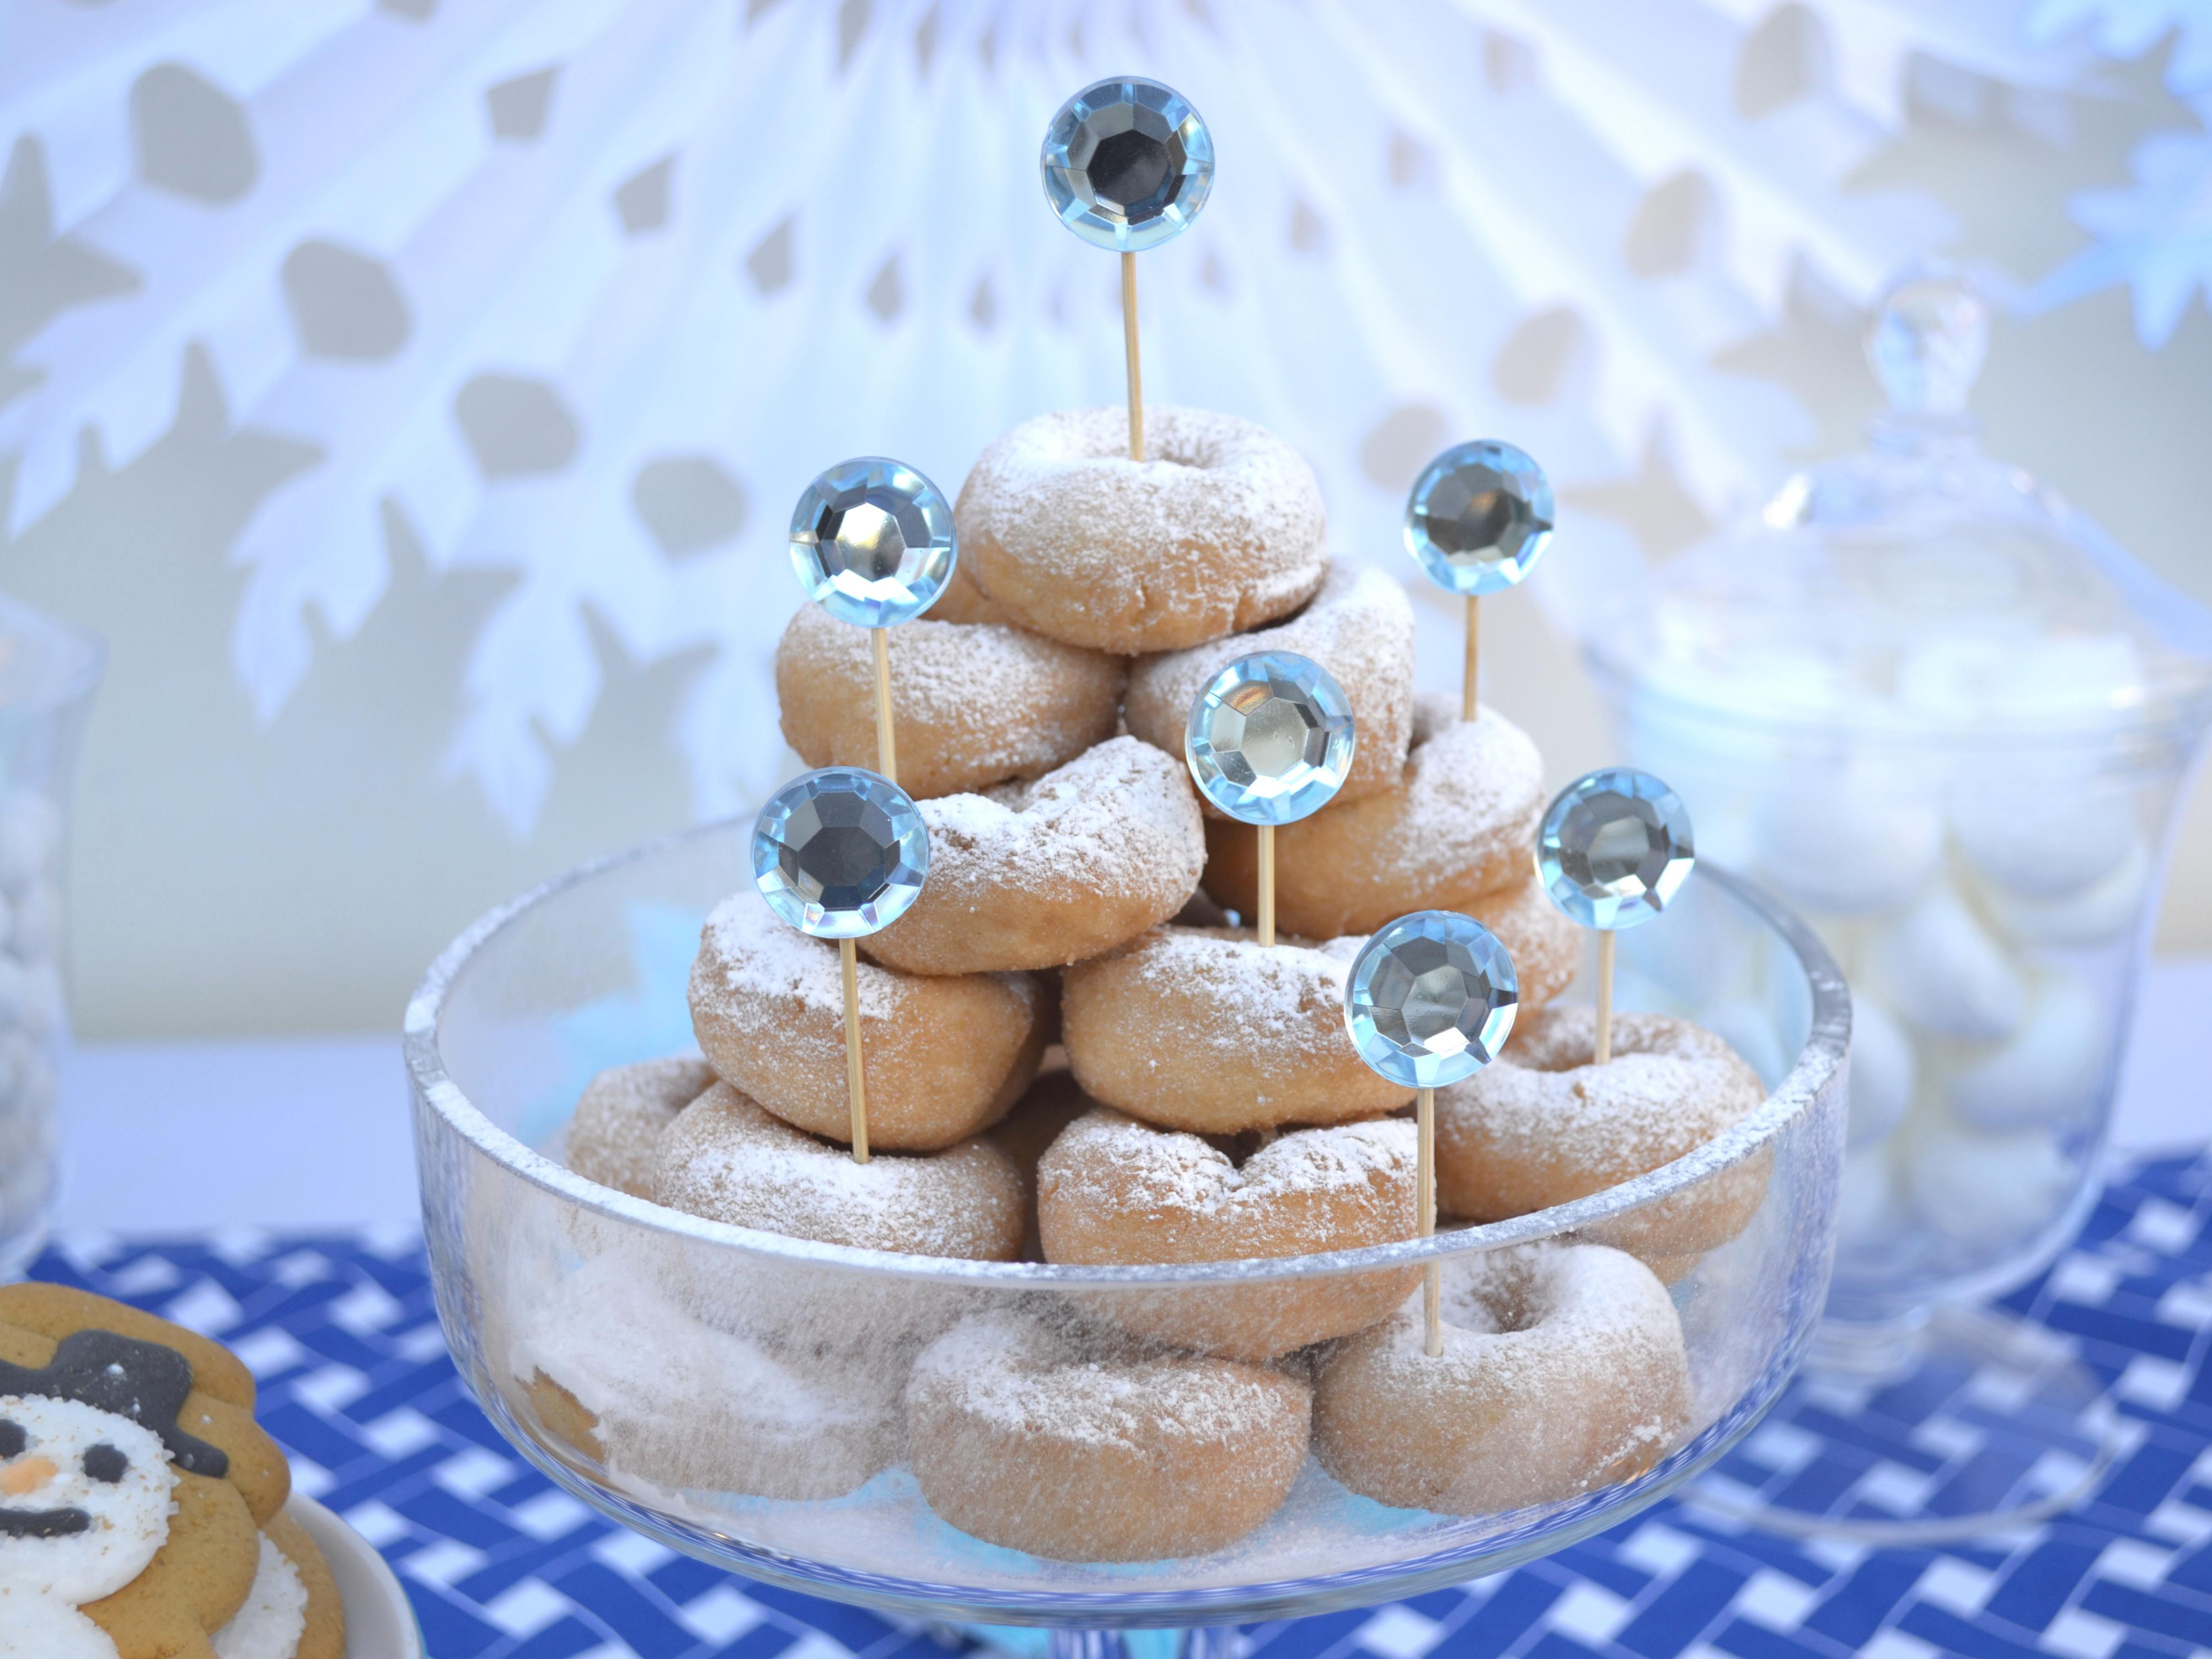 Christmas dessert table decoration ideas - Image